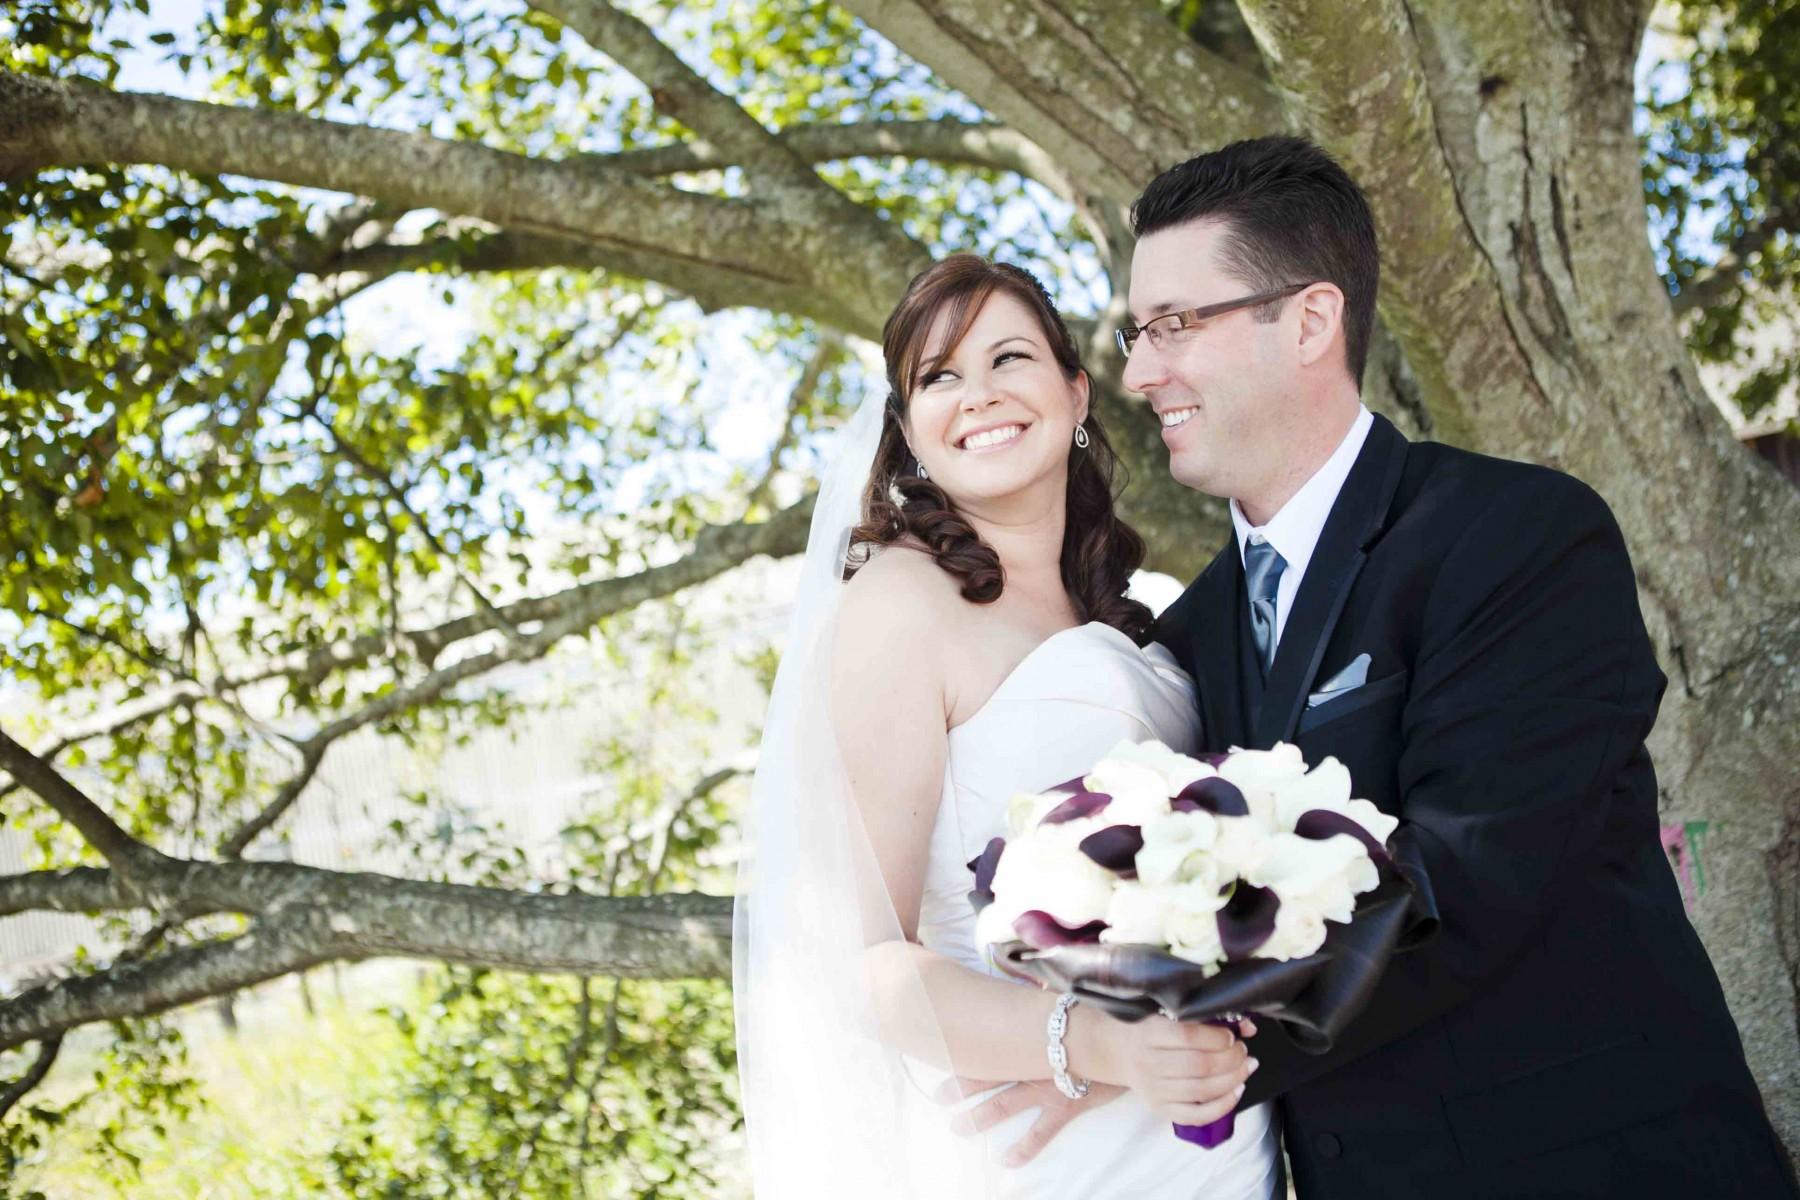 vancouver wedding photography, steveston, modern, fun